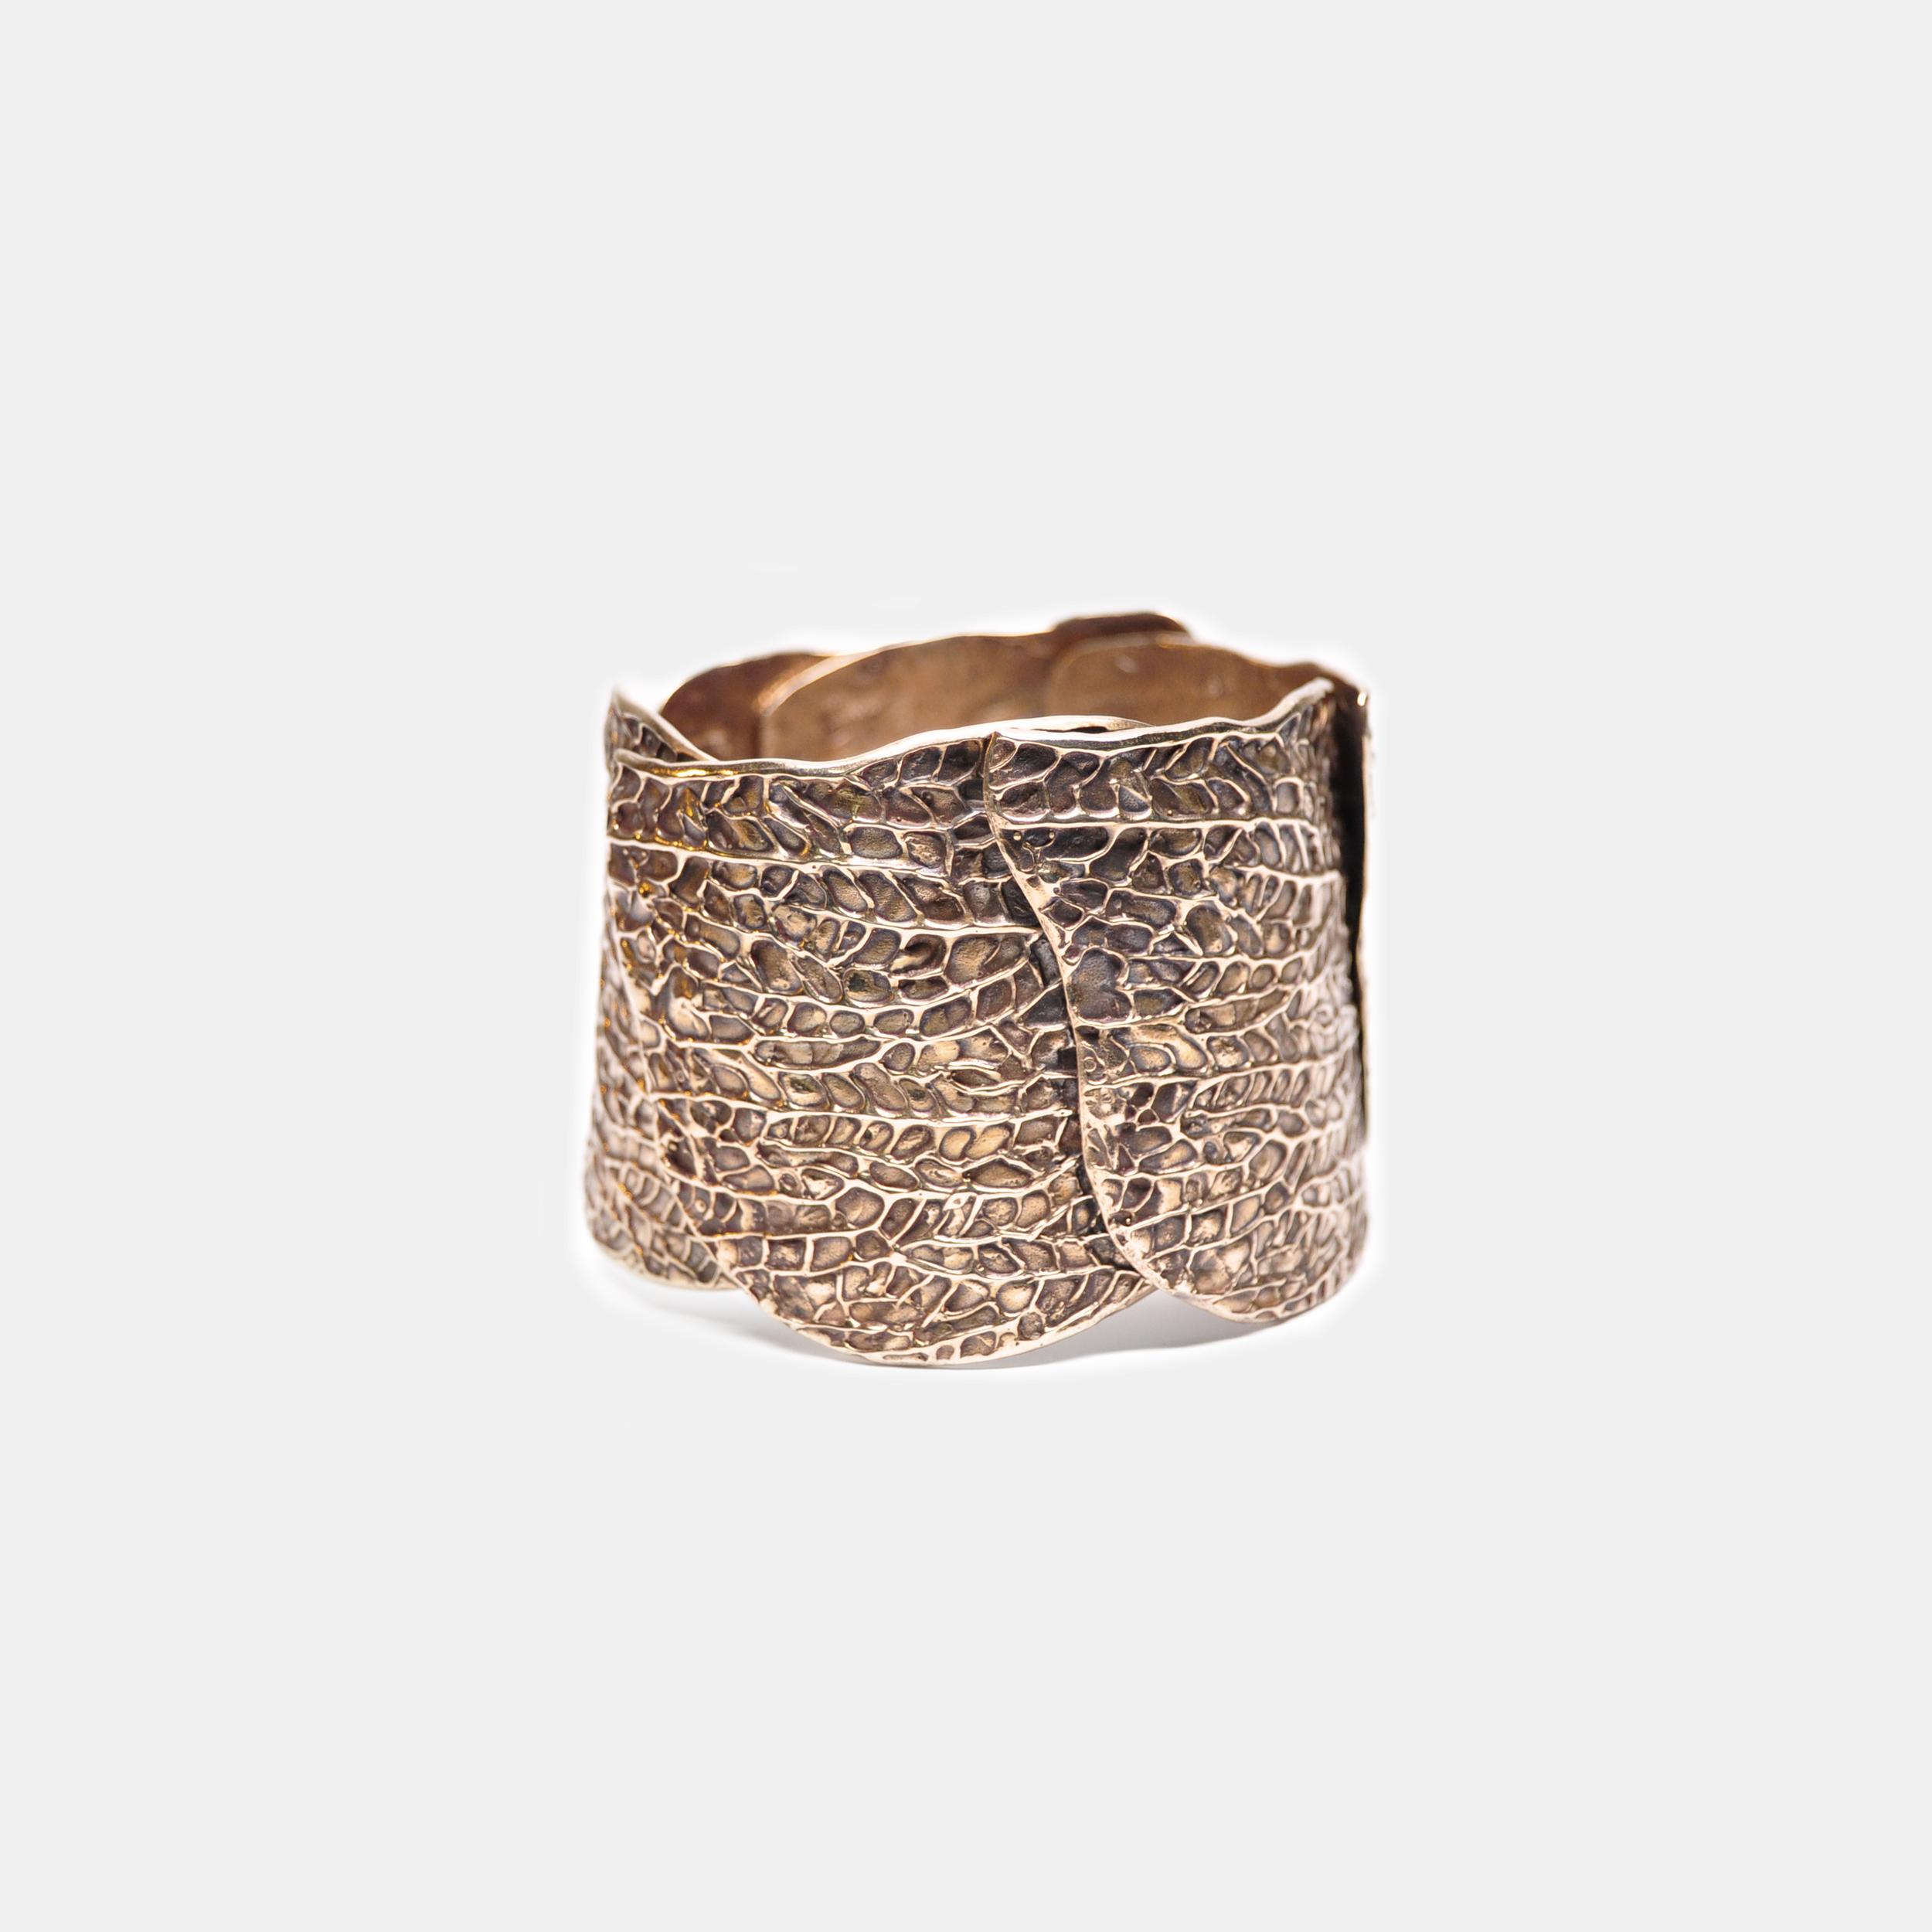 Marisa_Lomonaco_Hudson_Valley_custom_Jewelry_0000_Bronze_Coral_Lace_Bracelet.jpg